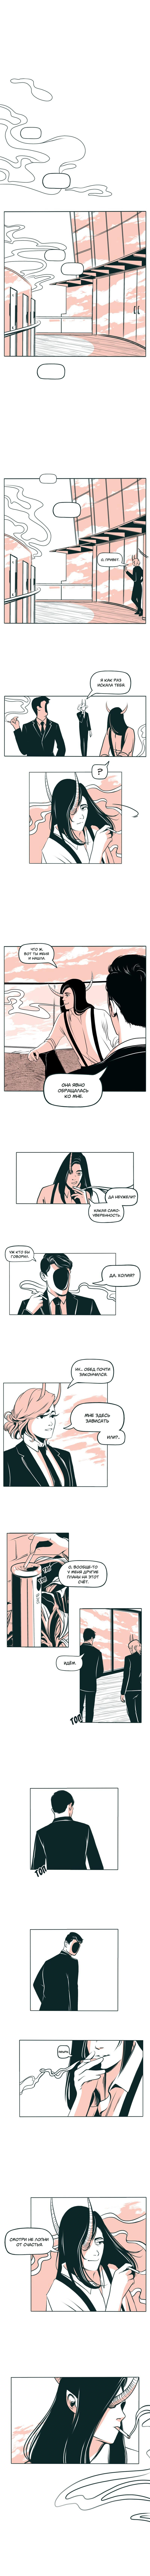 https://r1.ninemanga.com/comics/pic2/0/33536/431959/1535970727140.jpg Page 1